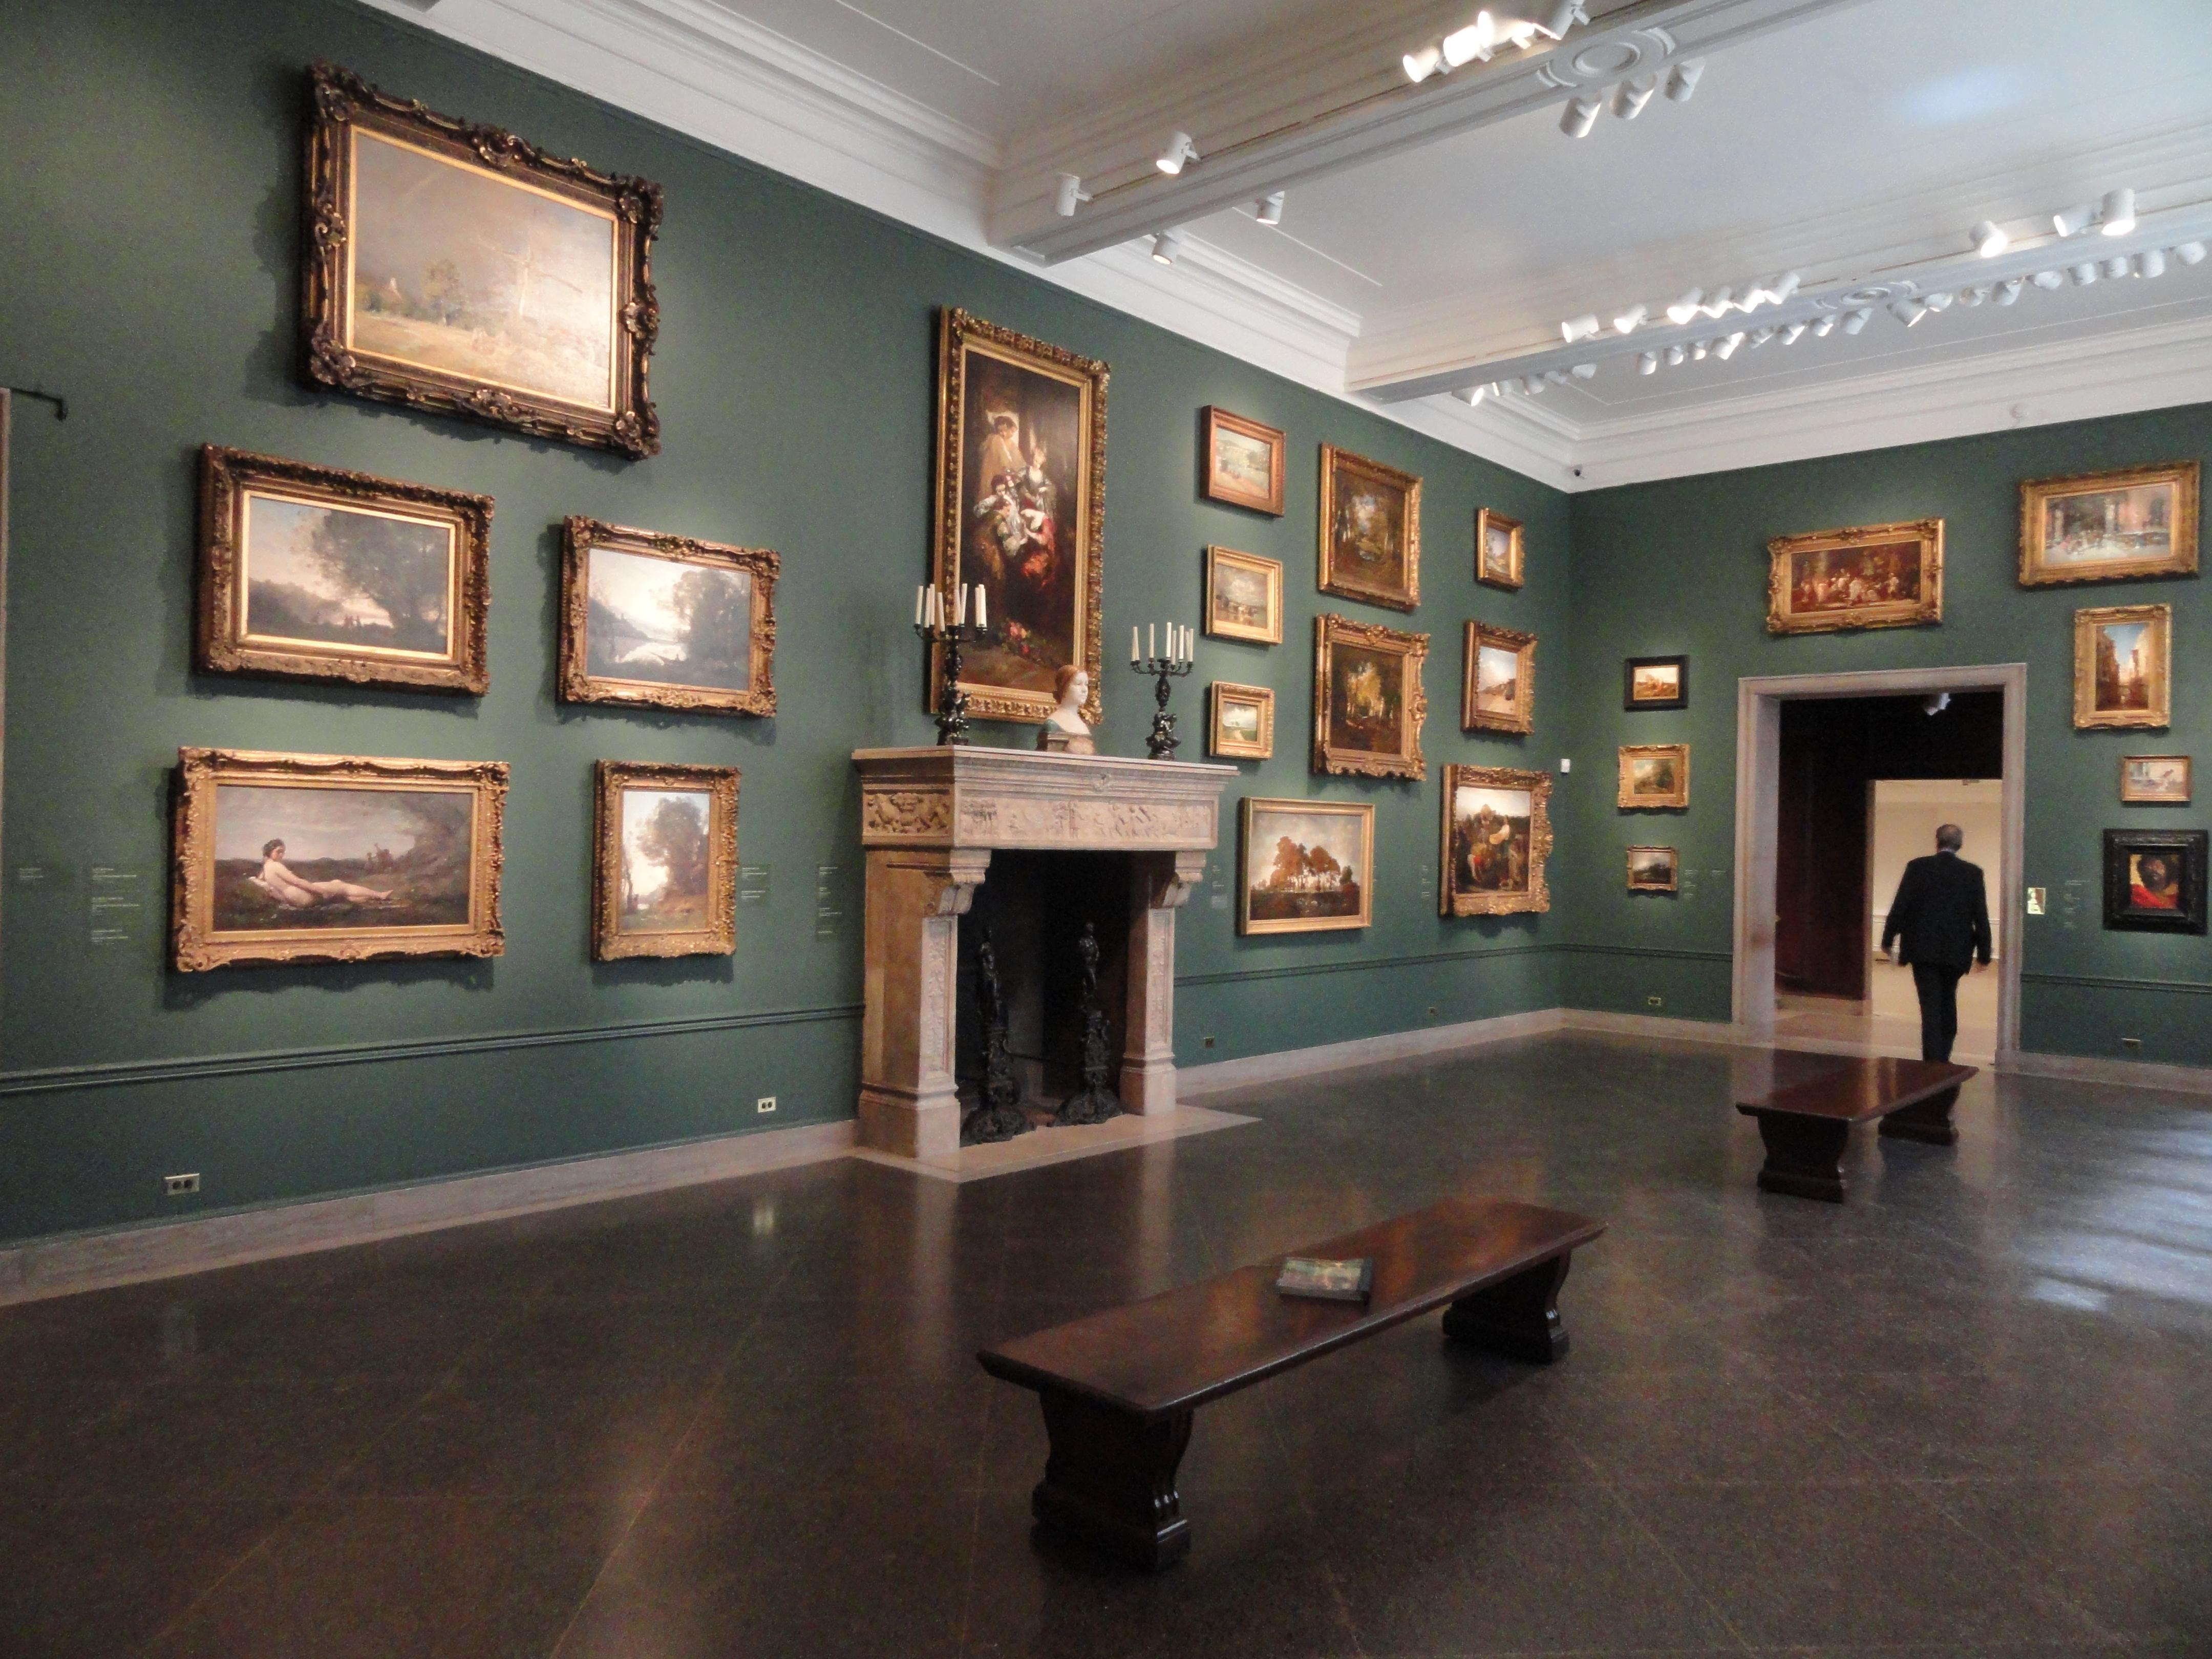 File:Interior   Corcoran Gallery Of Art   DSC01197.JPG